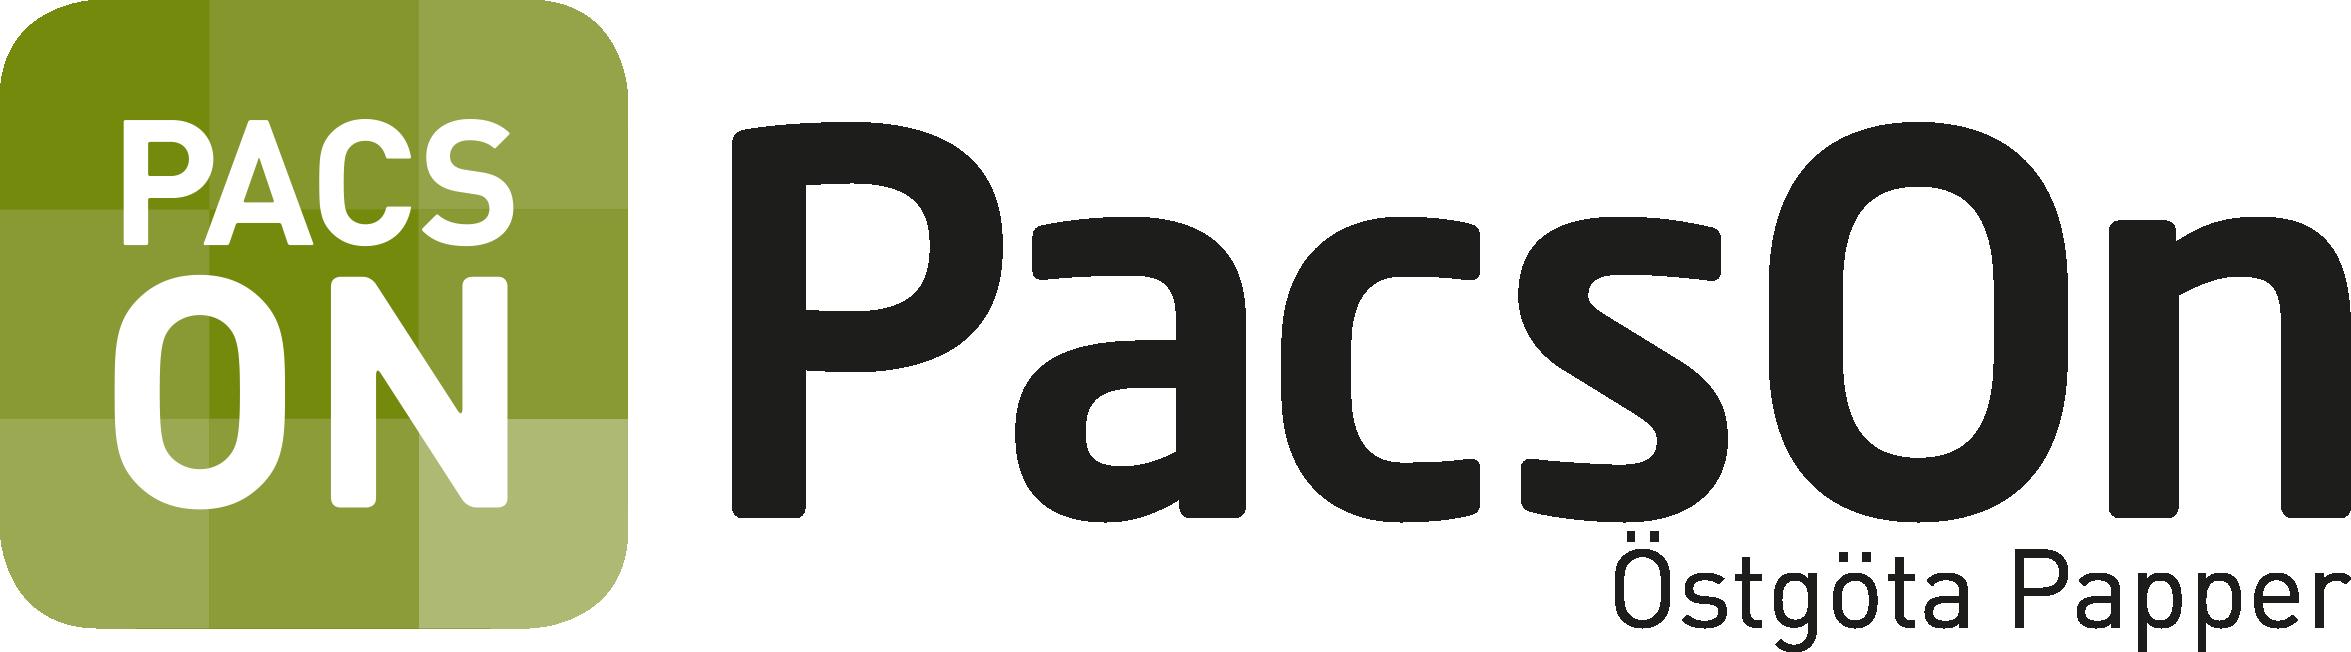 Pacson